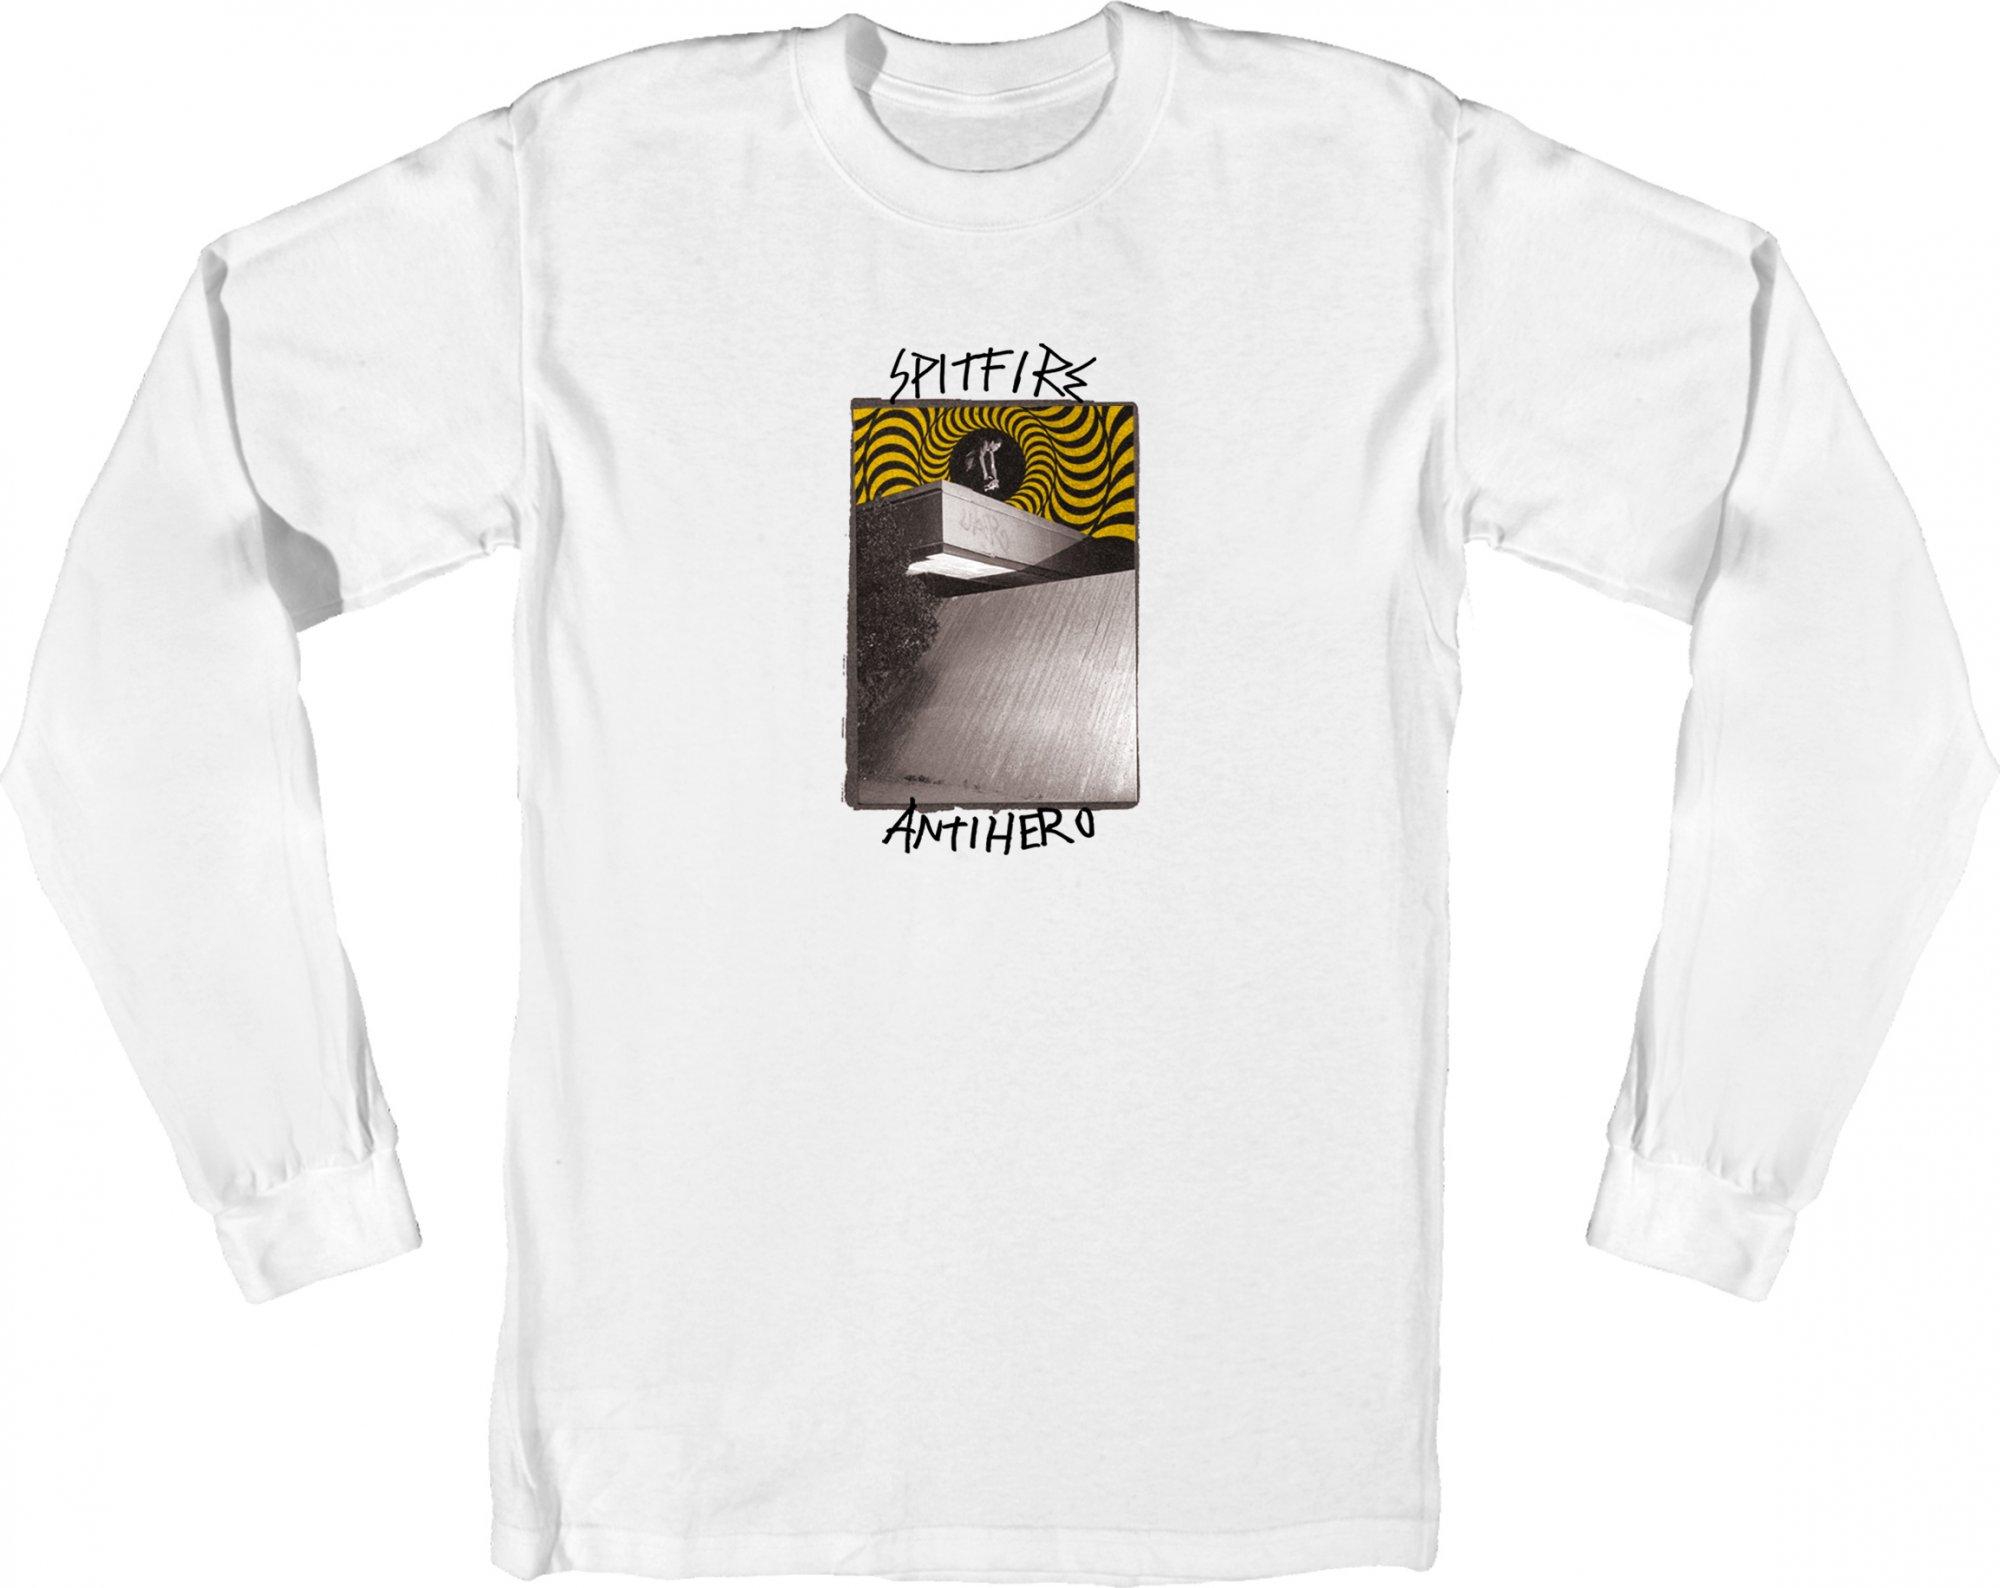 Spitfire X Antihero Cardiel Carwash l/s white